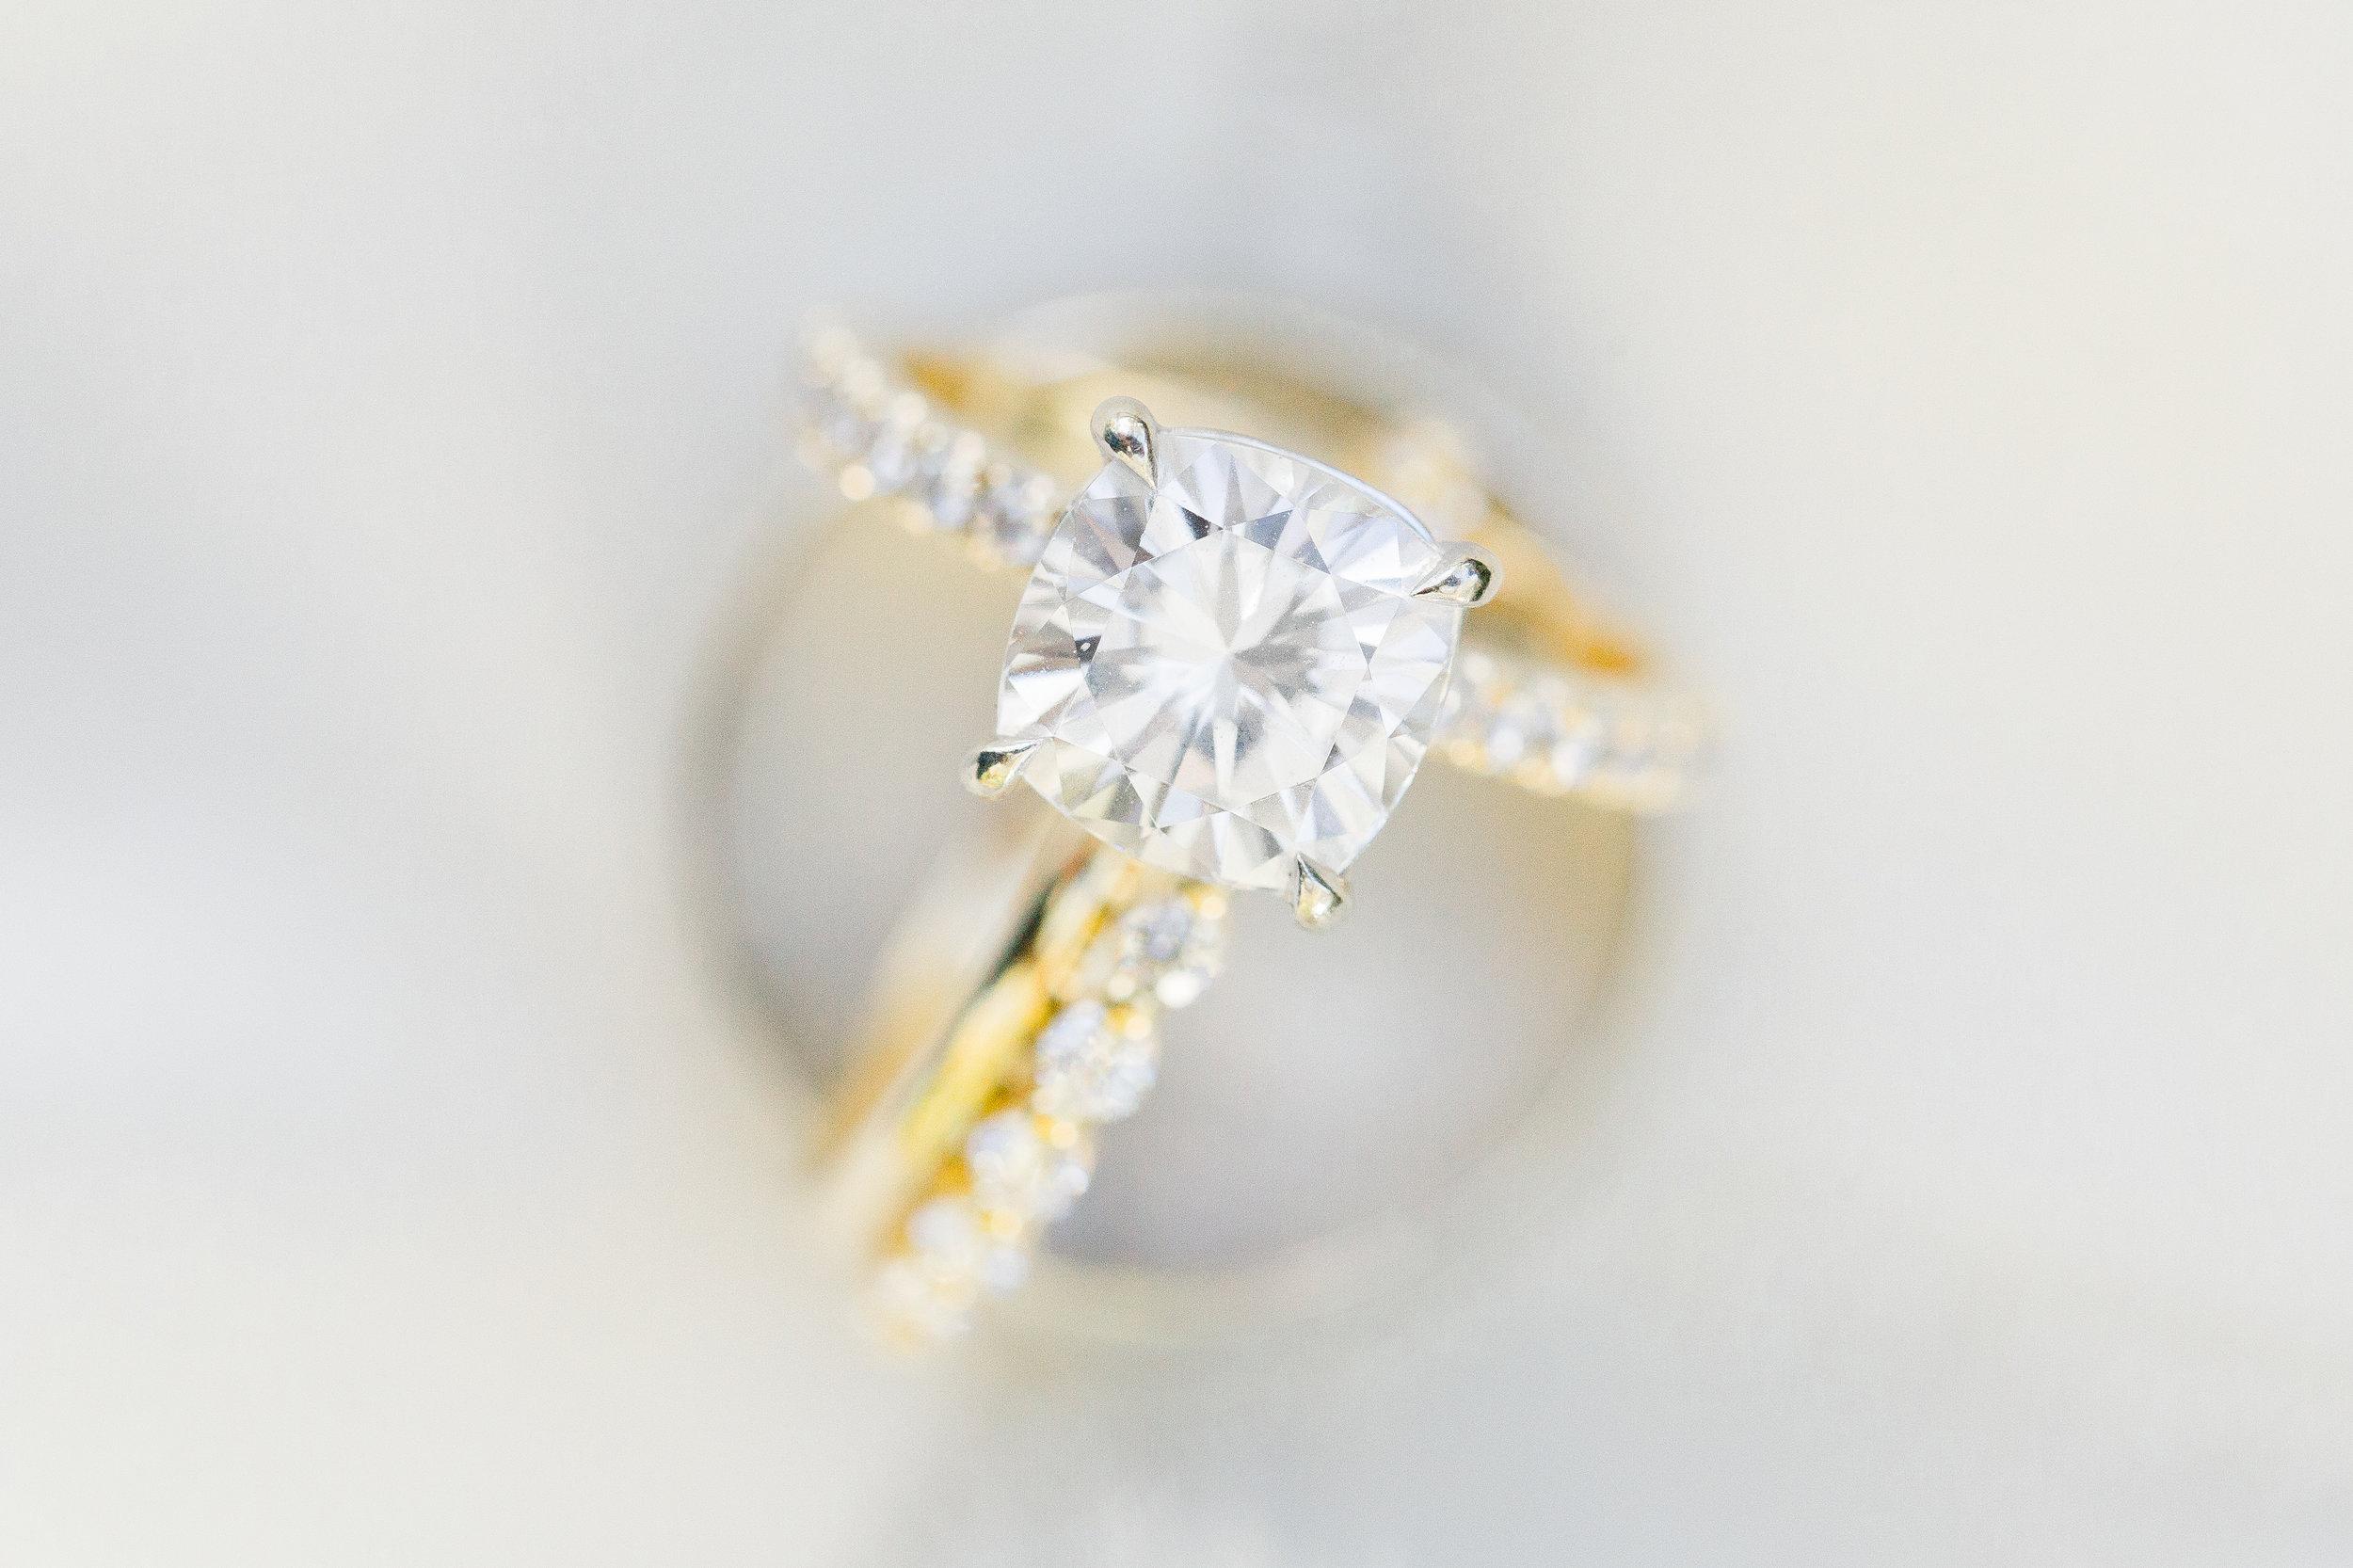 luxury-wedding-photographer-captures-wedding-ring-designs (1 of)-2.jpg